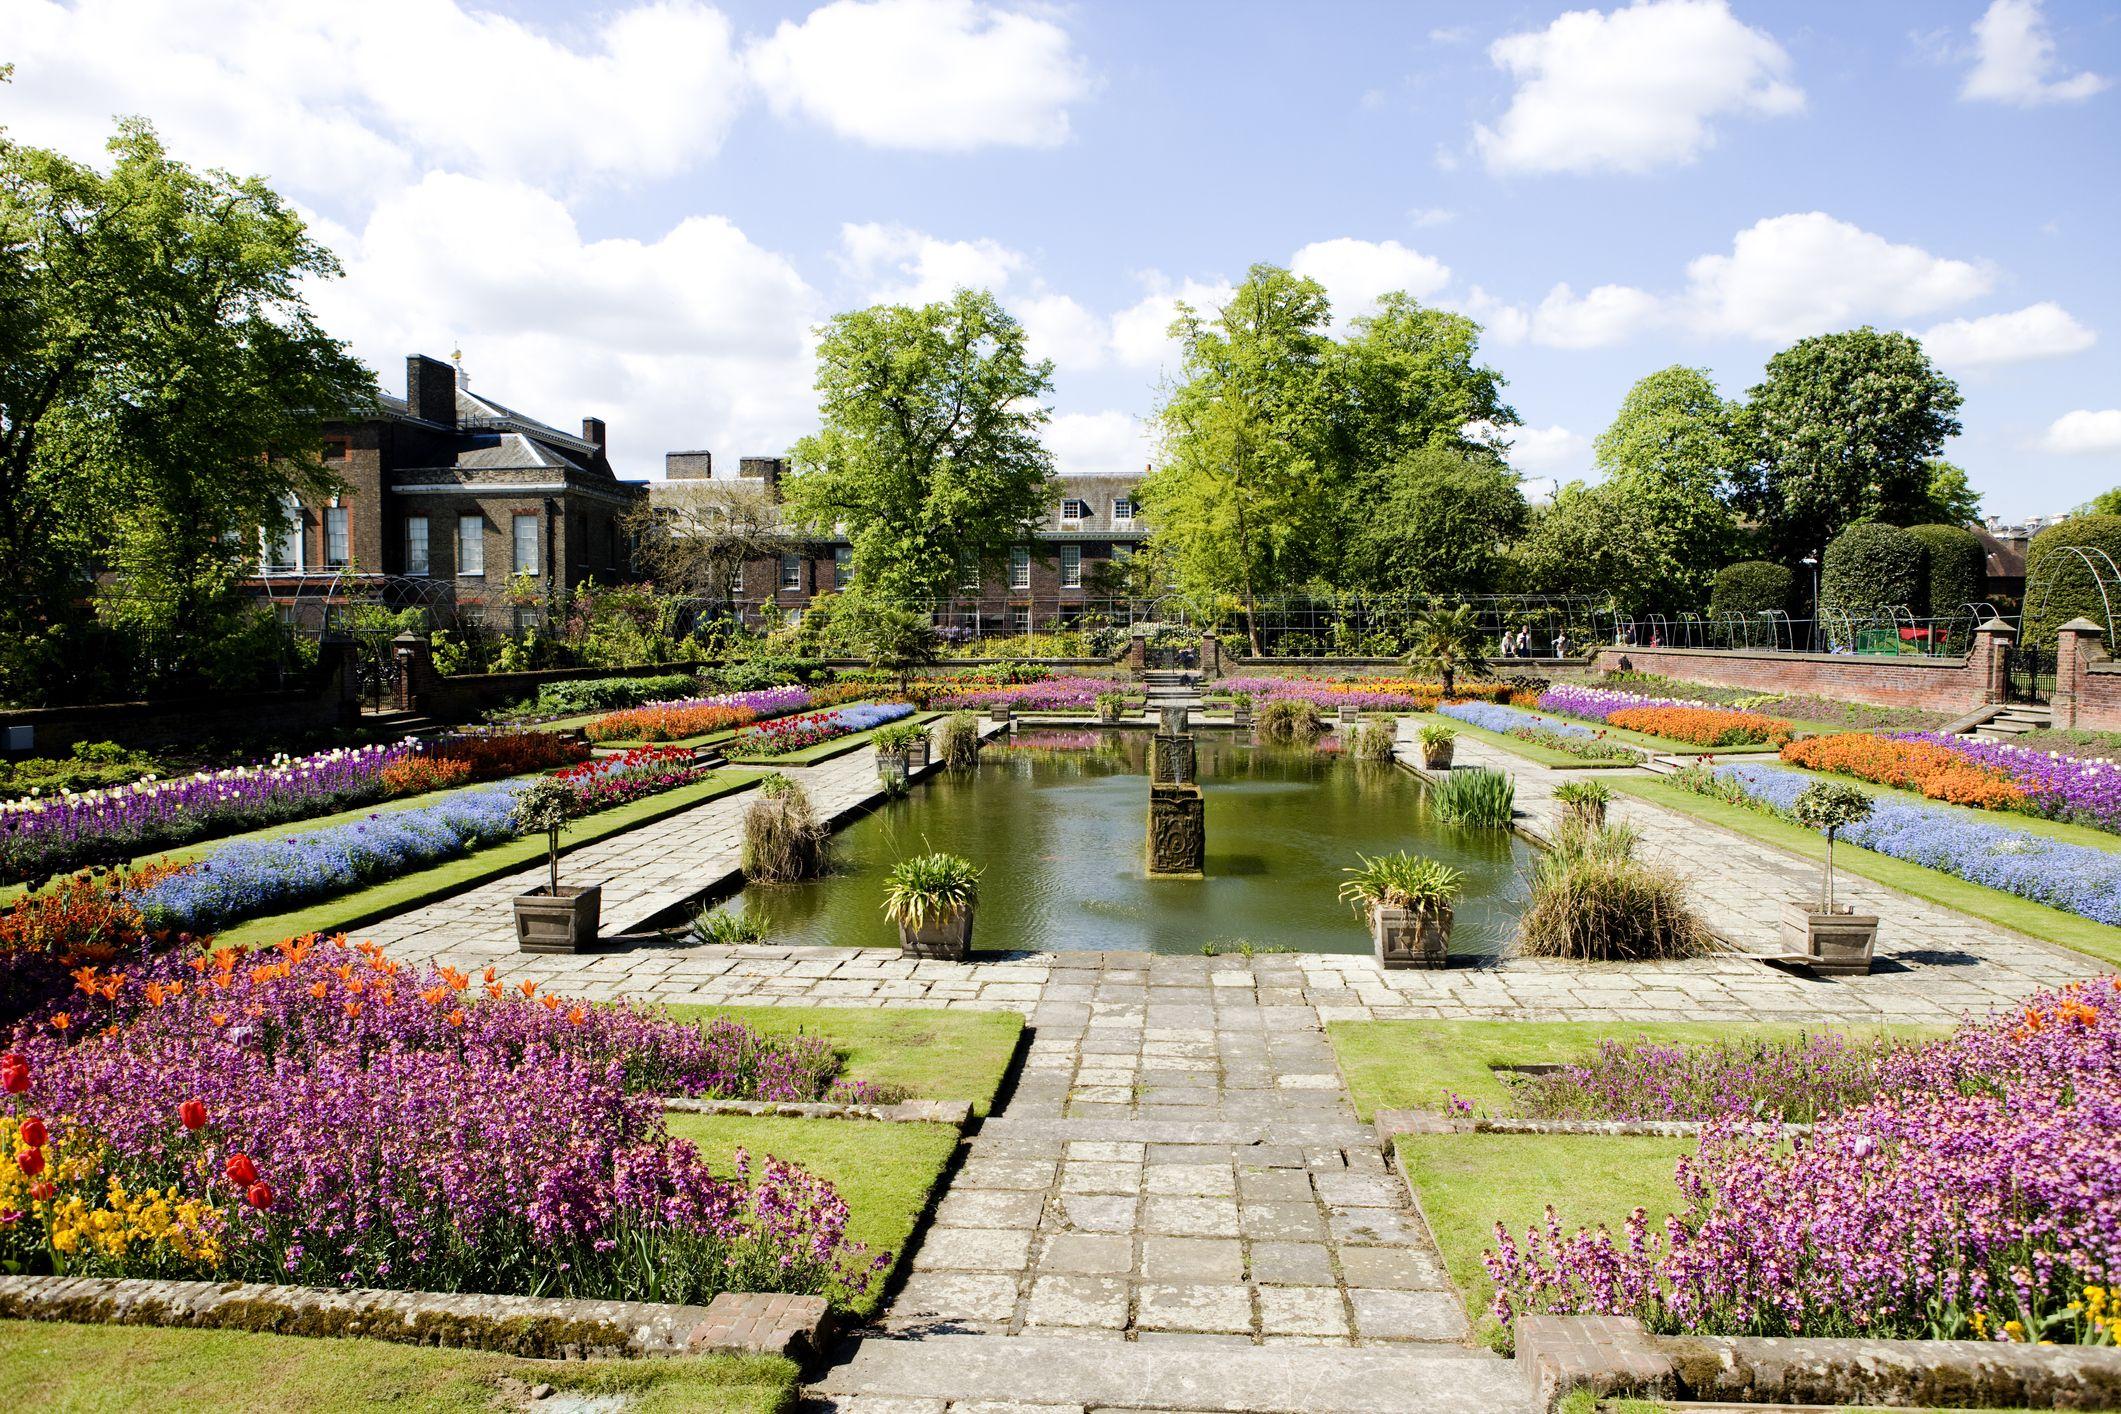 Kensington Palace unveils its beautiful wildflower garden